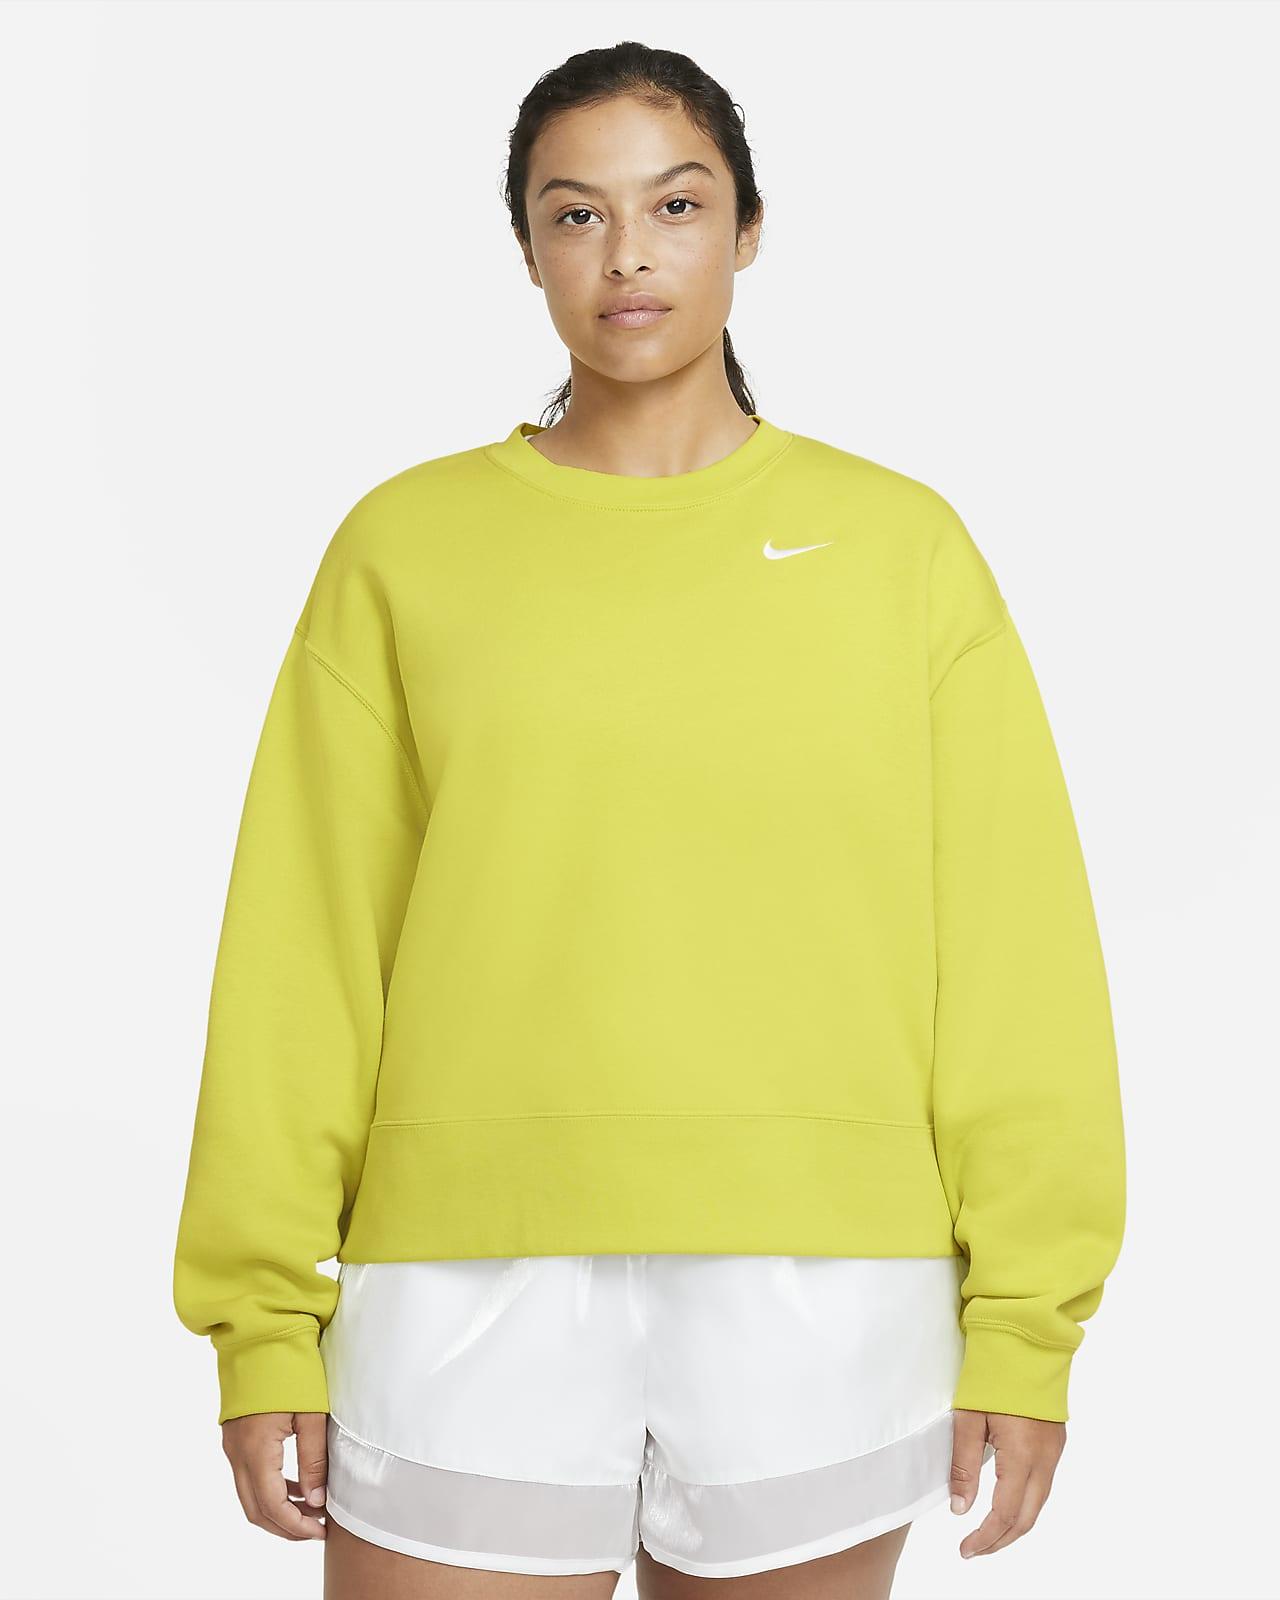 Haut Nike Sportswear Essential pour Femme (grande taille)